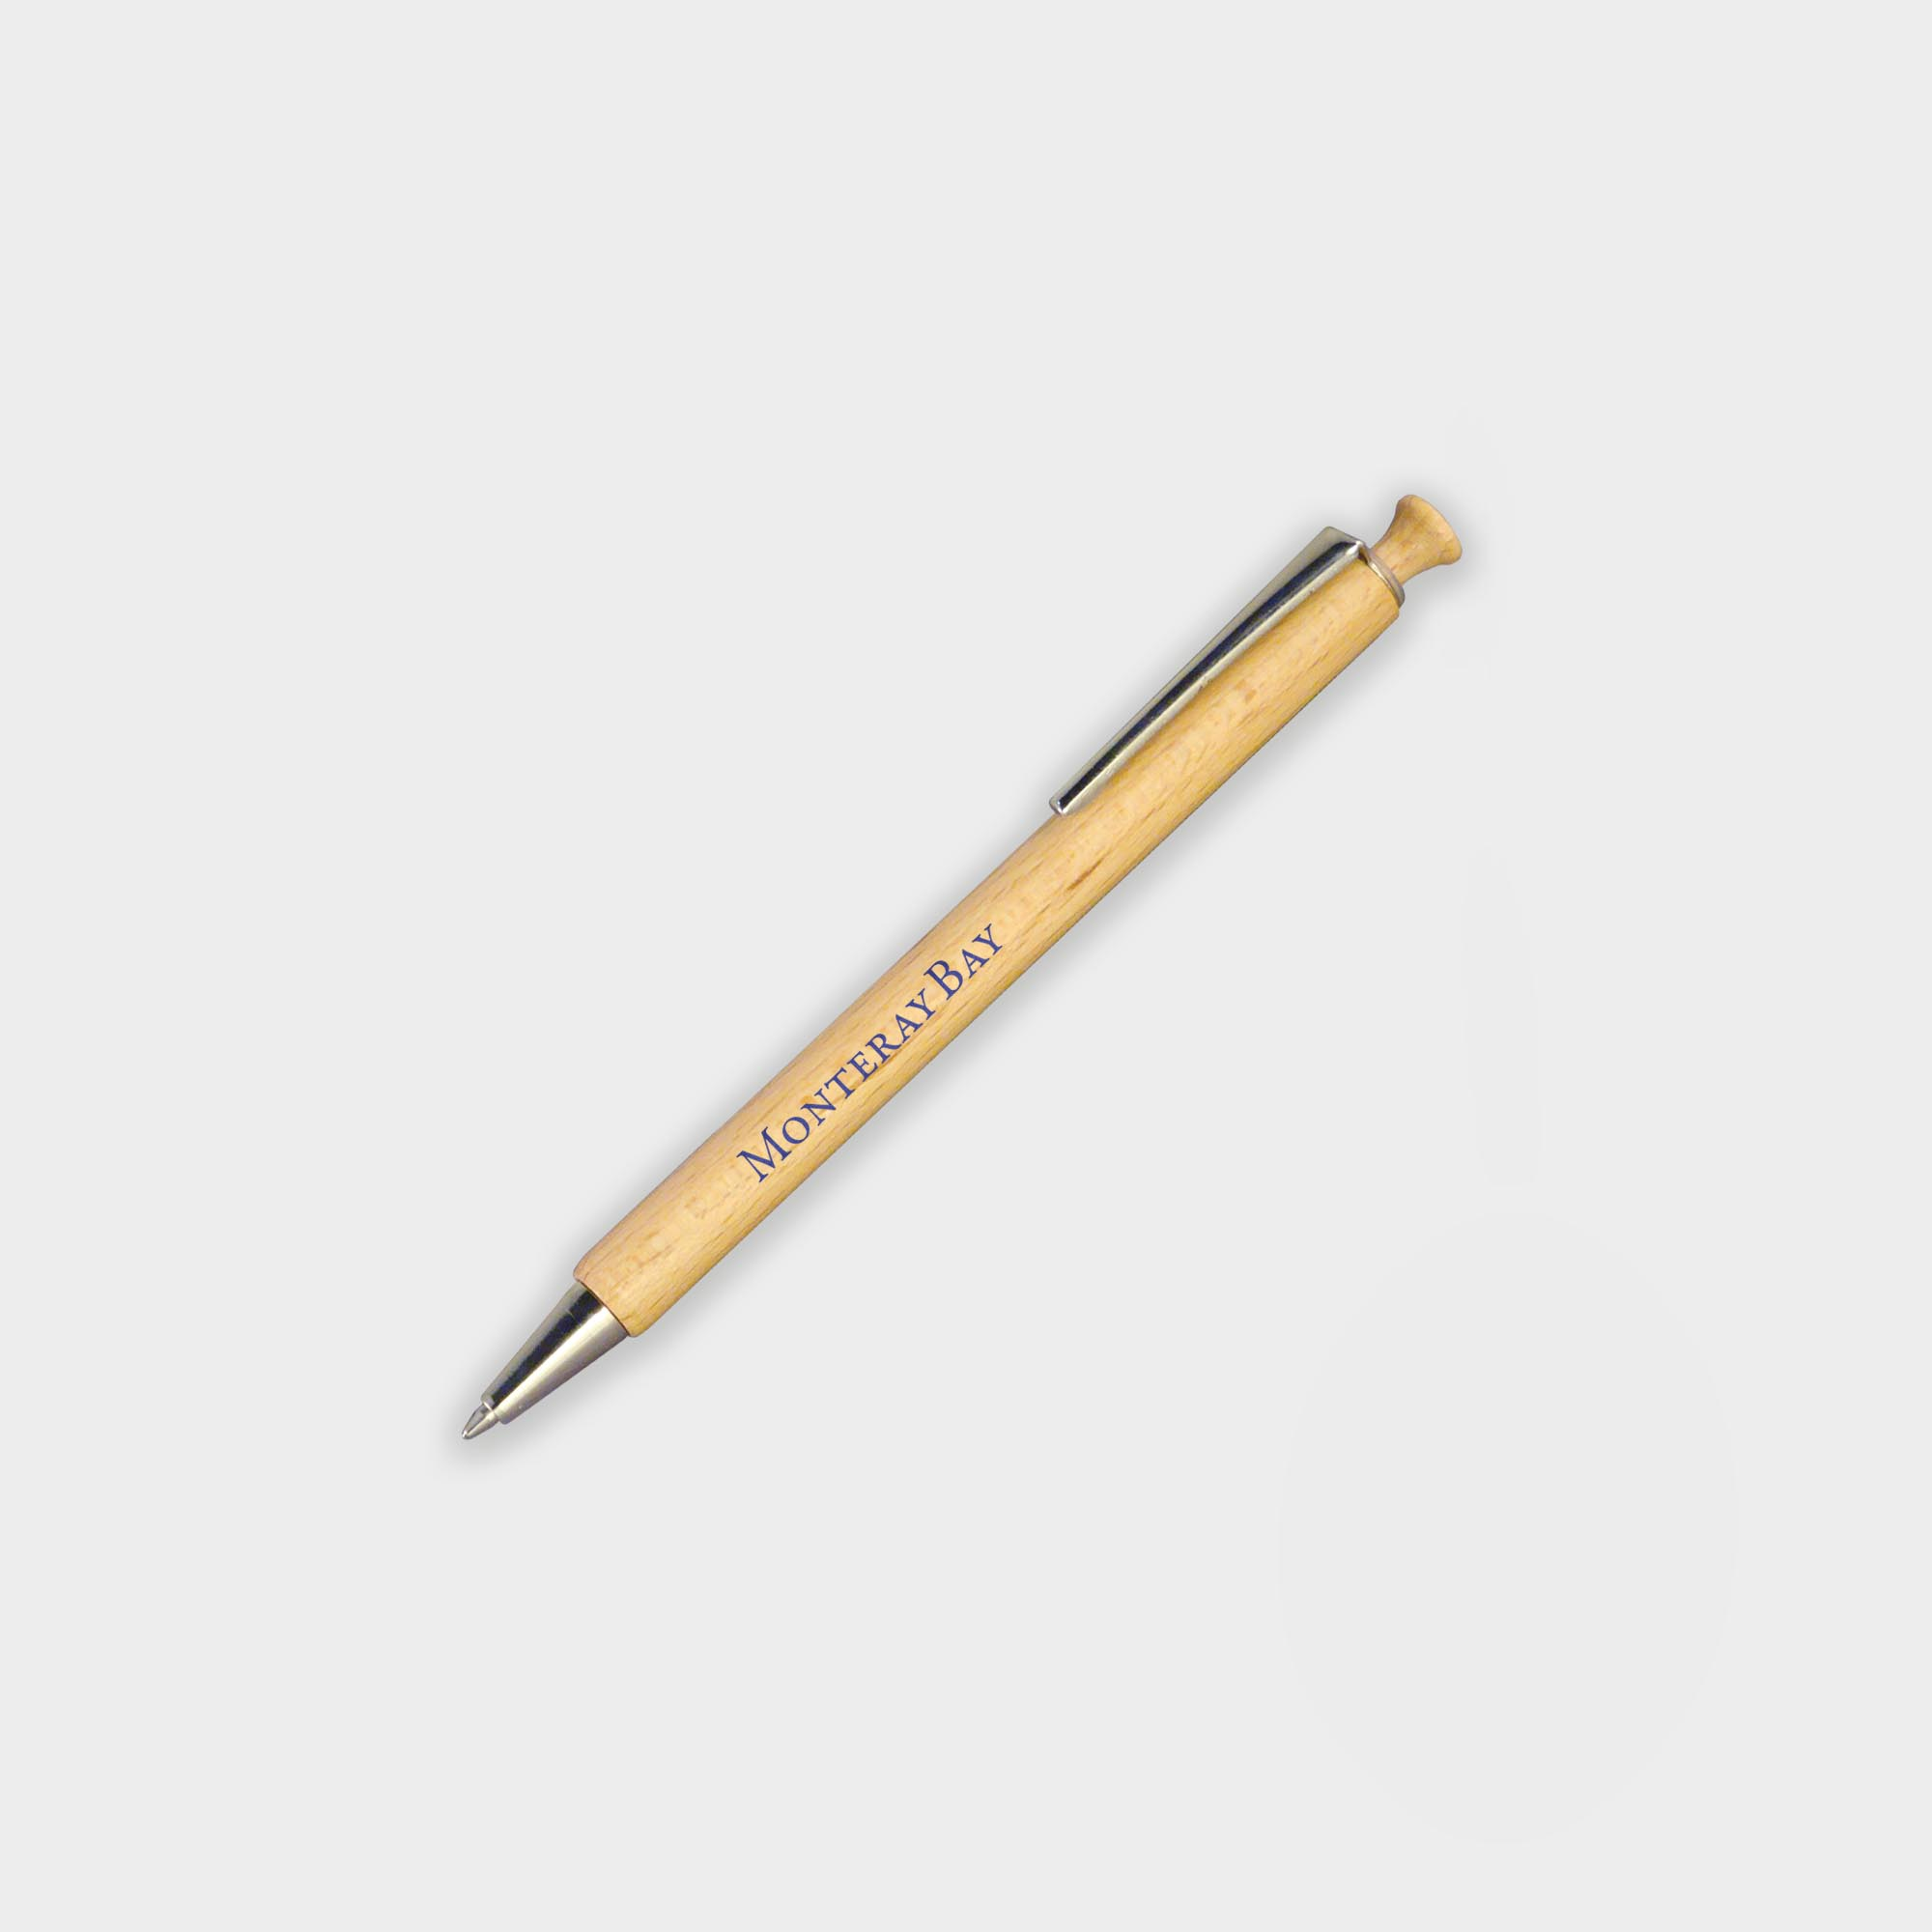 Promotional Albero Sustainable Wood Pen